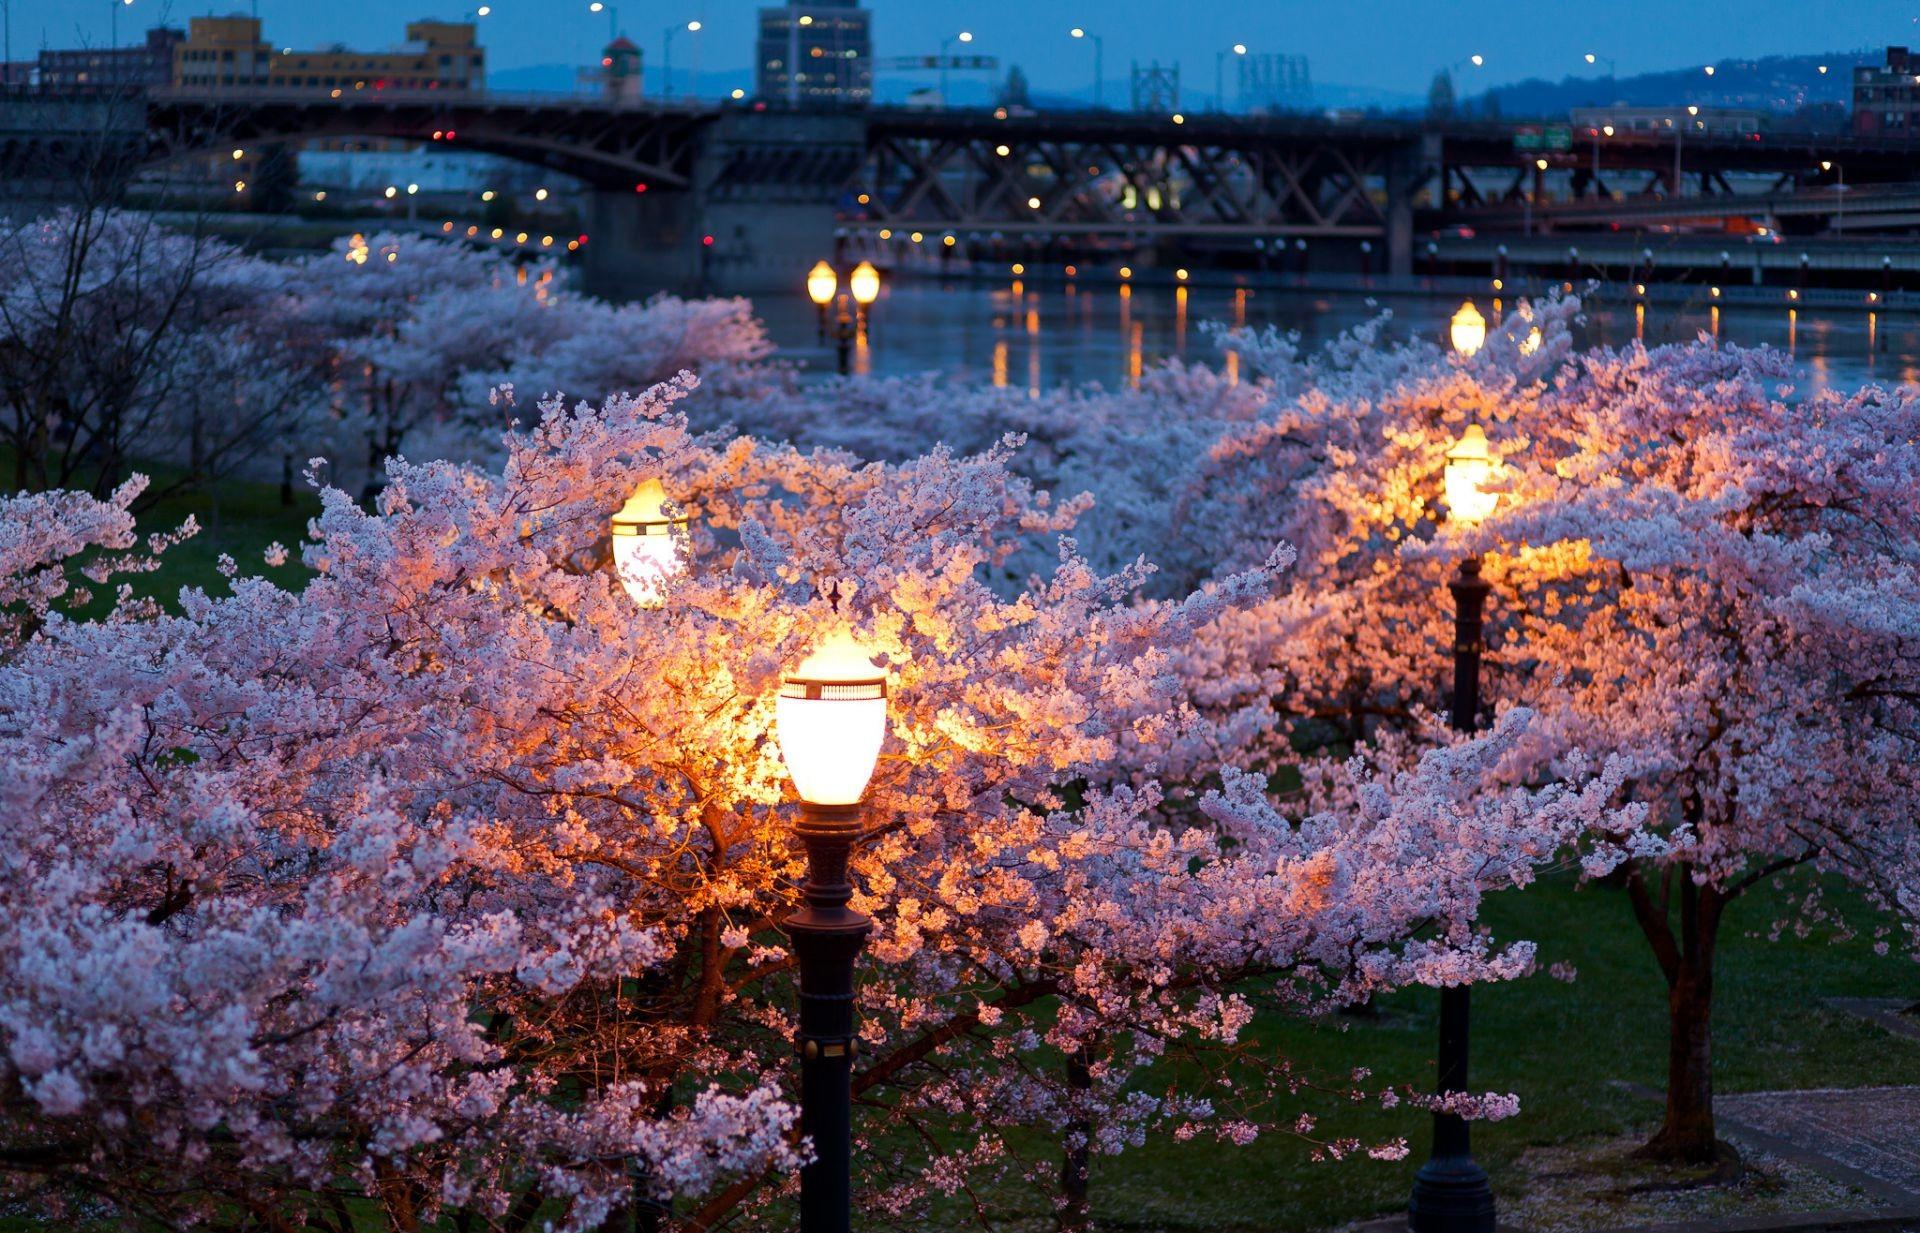 The Lights Of The City Night Lights Evening Spring Bridges